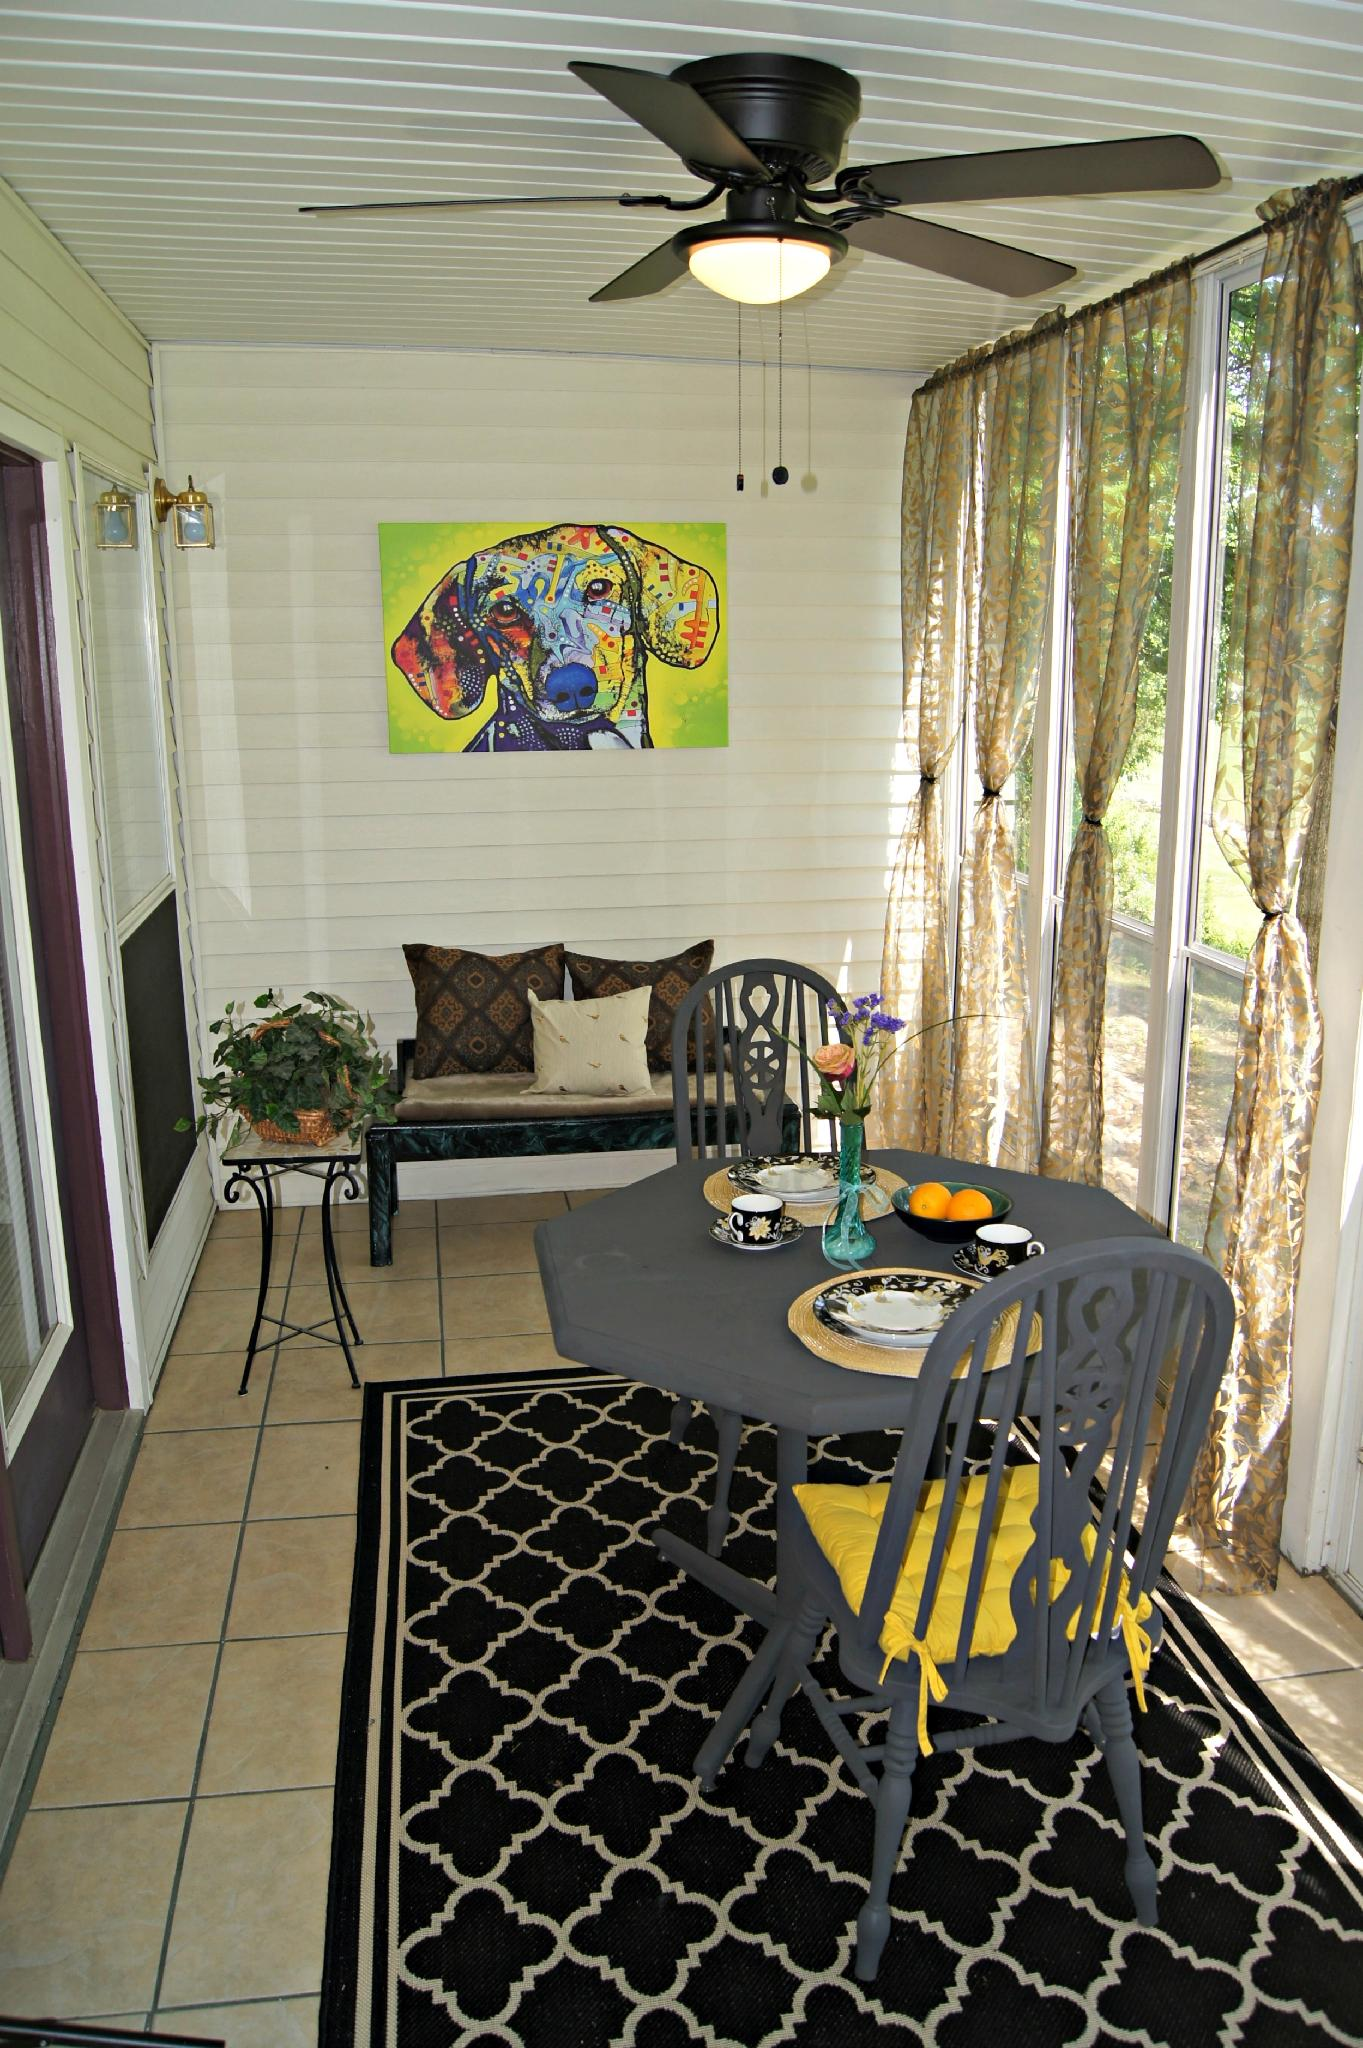 2 Bedroom  Condo, Near the Strip, 1000 Hills Golf View; Sleeps 8; Club A-4